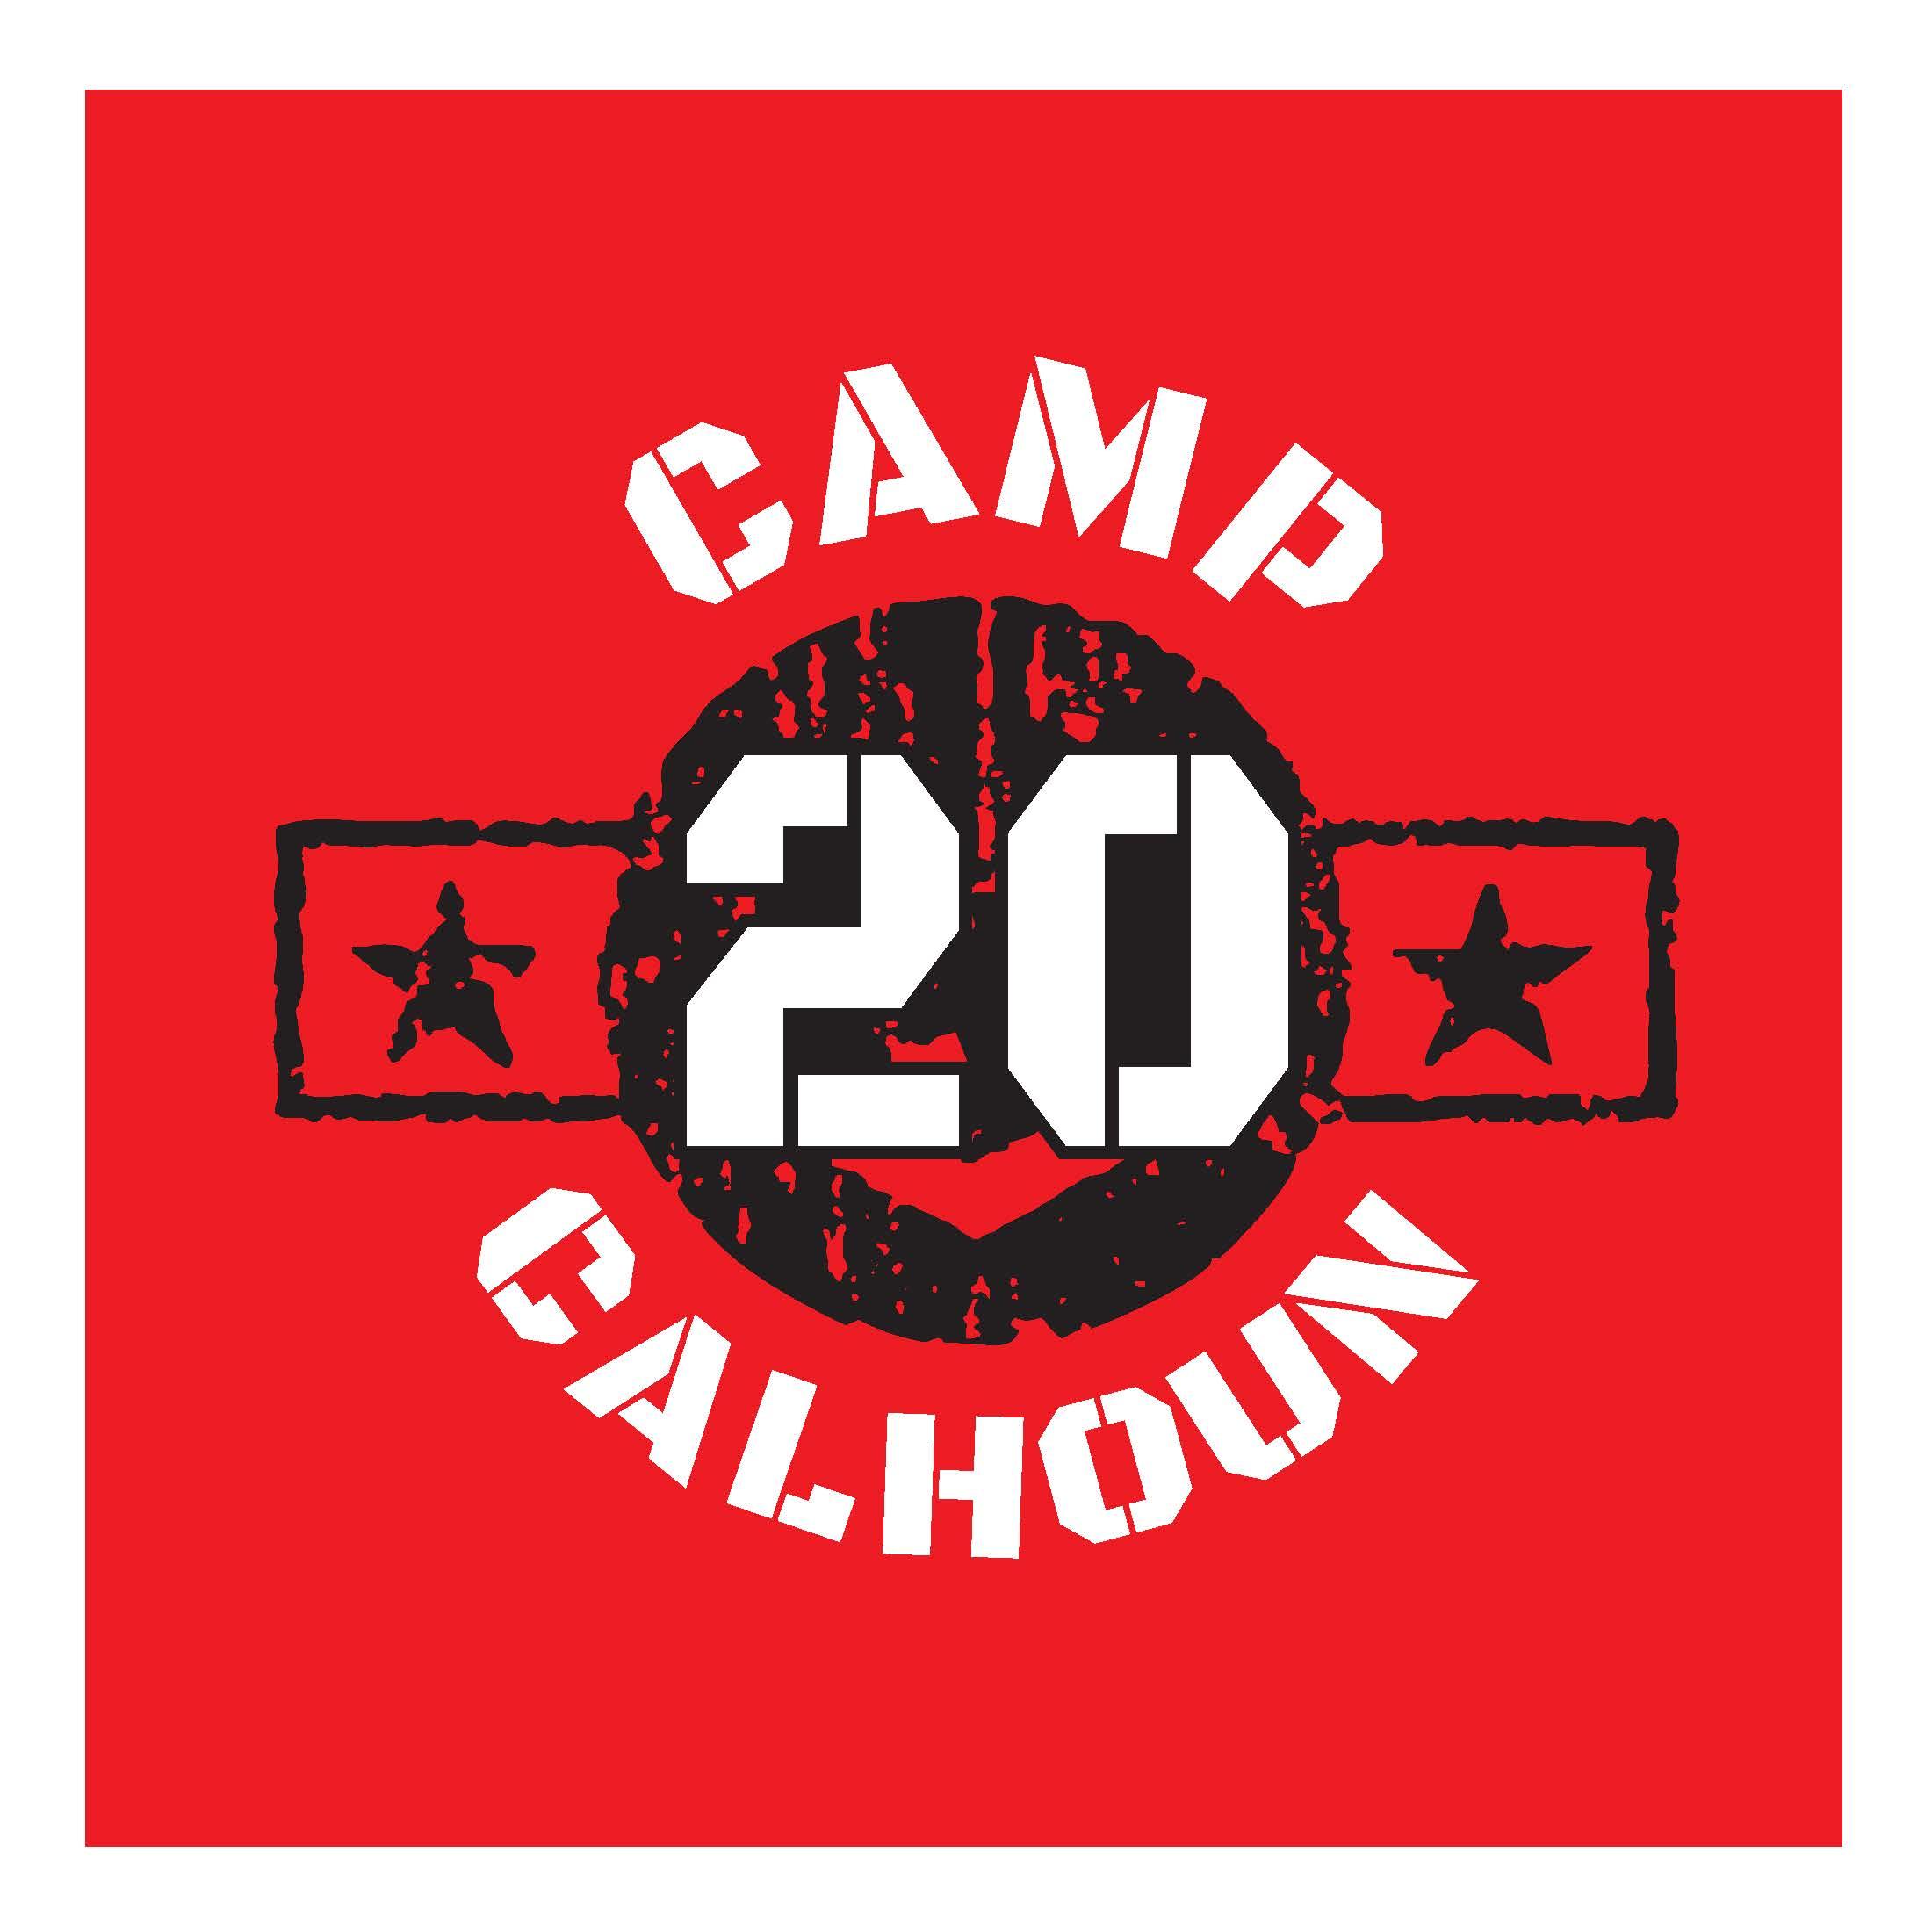 CAMP-019